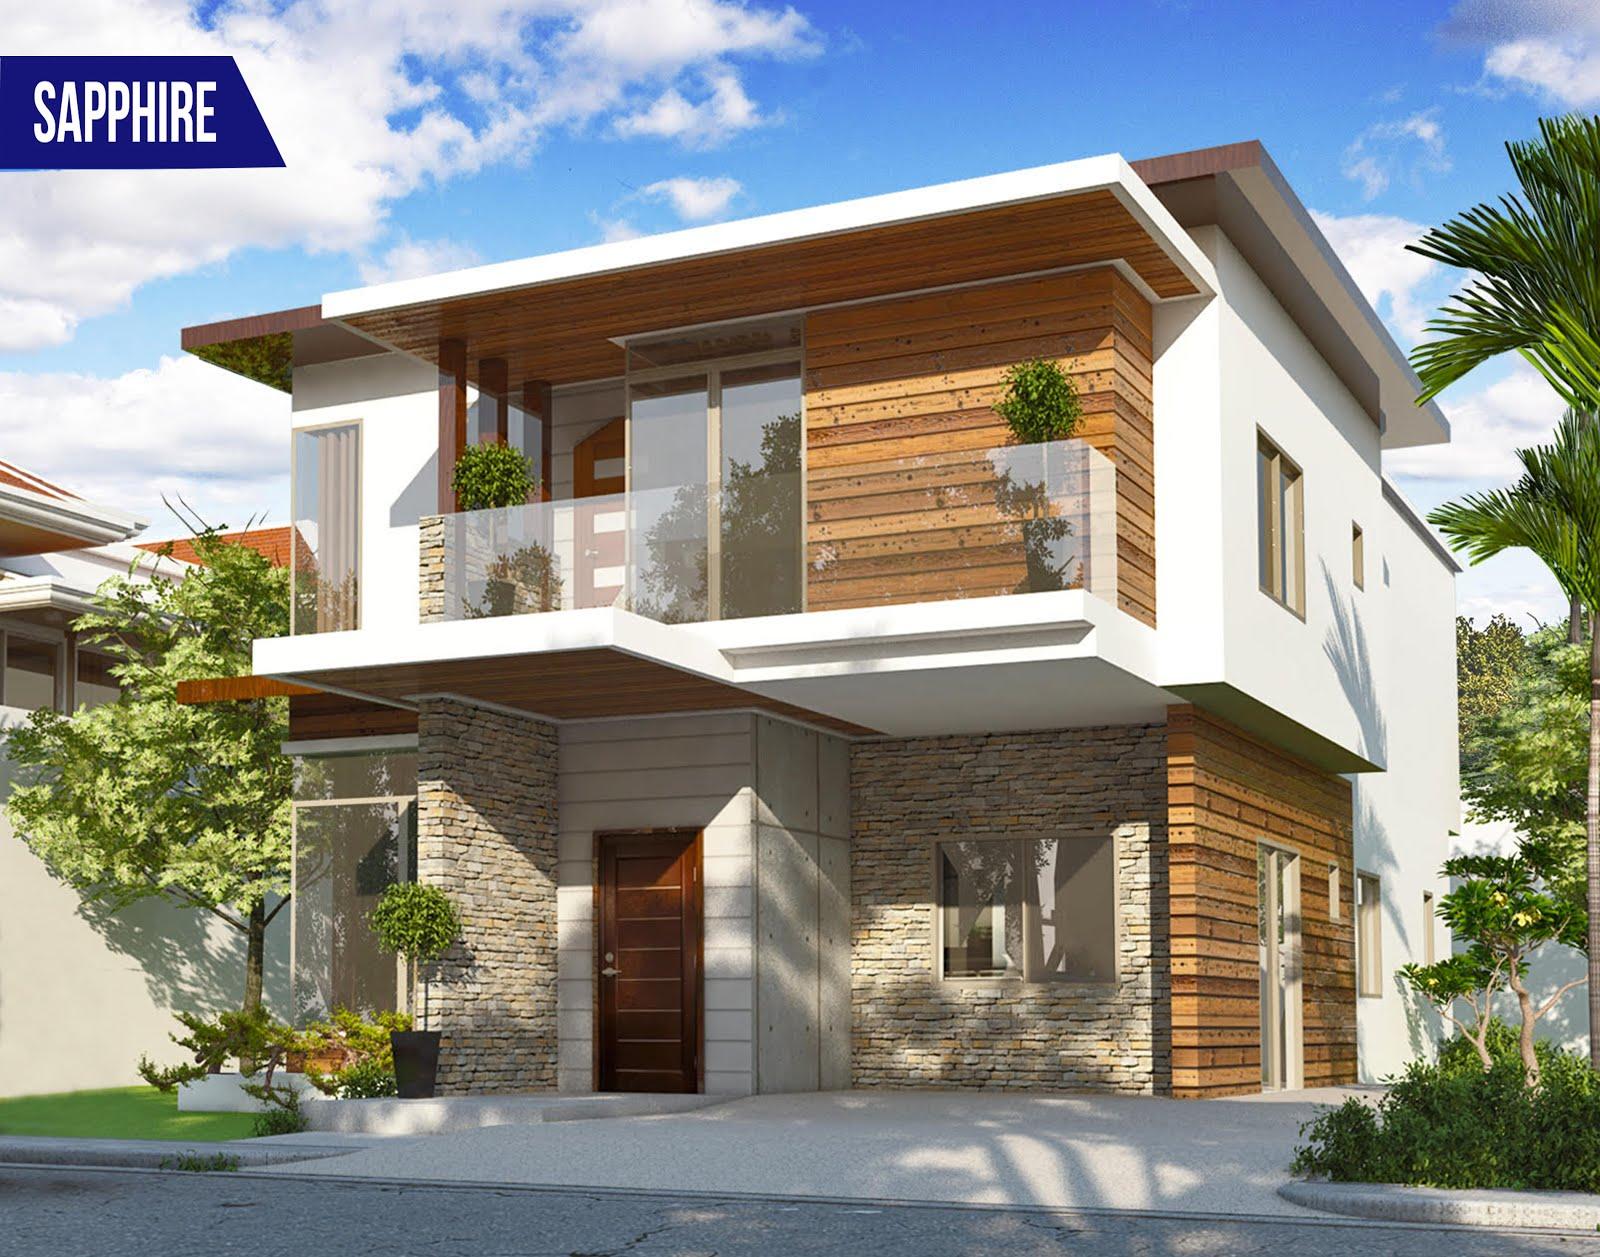 A Smart Philippine House Builder: September 2016